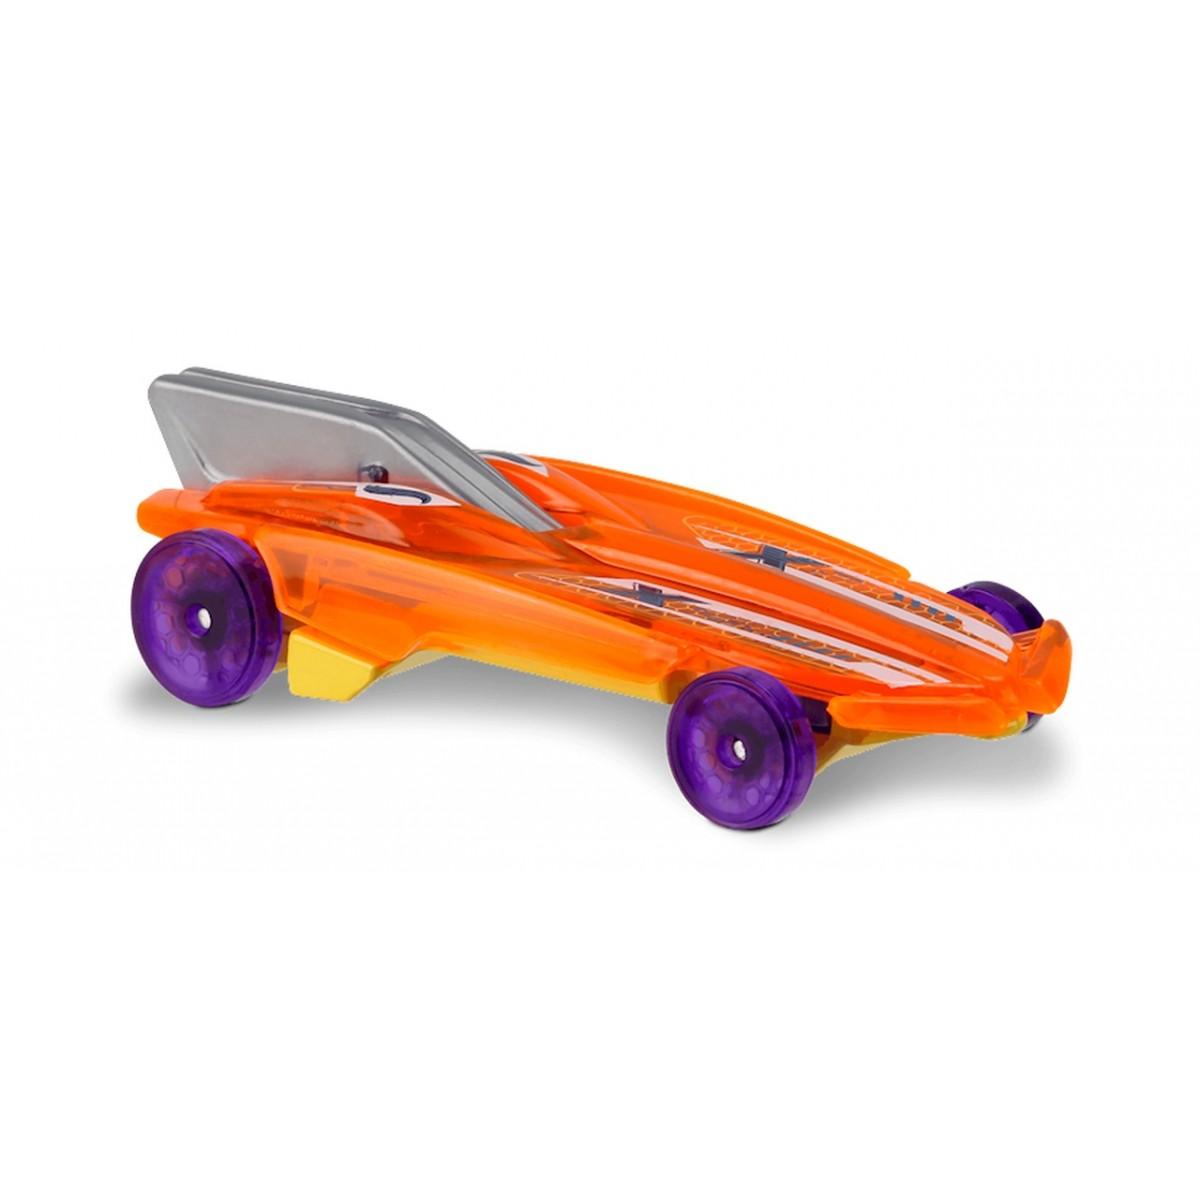 Carrinho Hot Wheels: HW Formula Solar Laranja